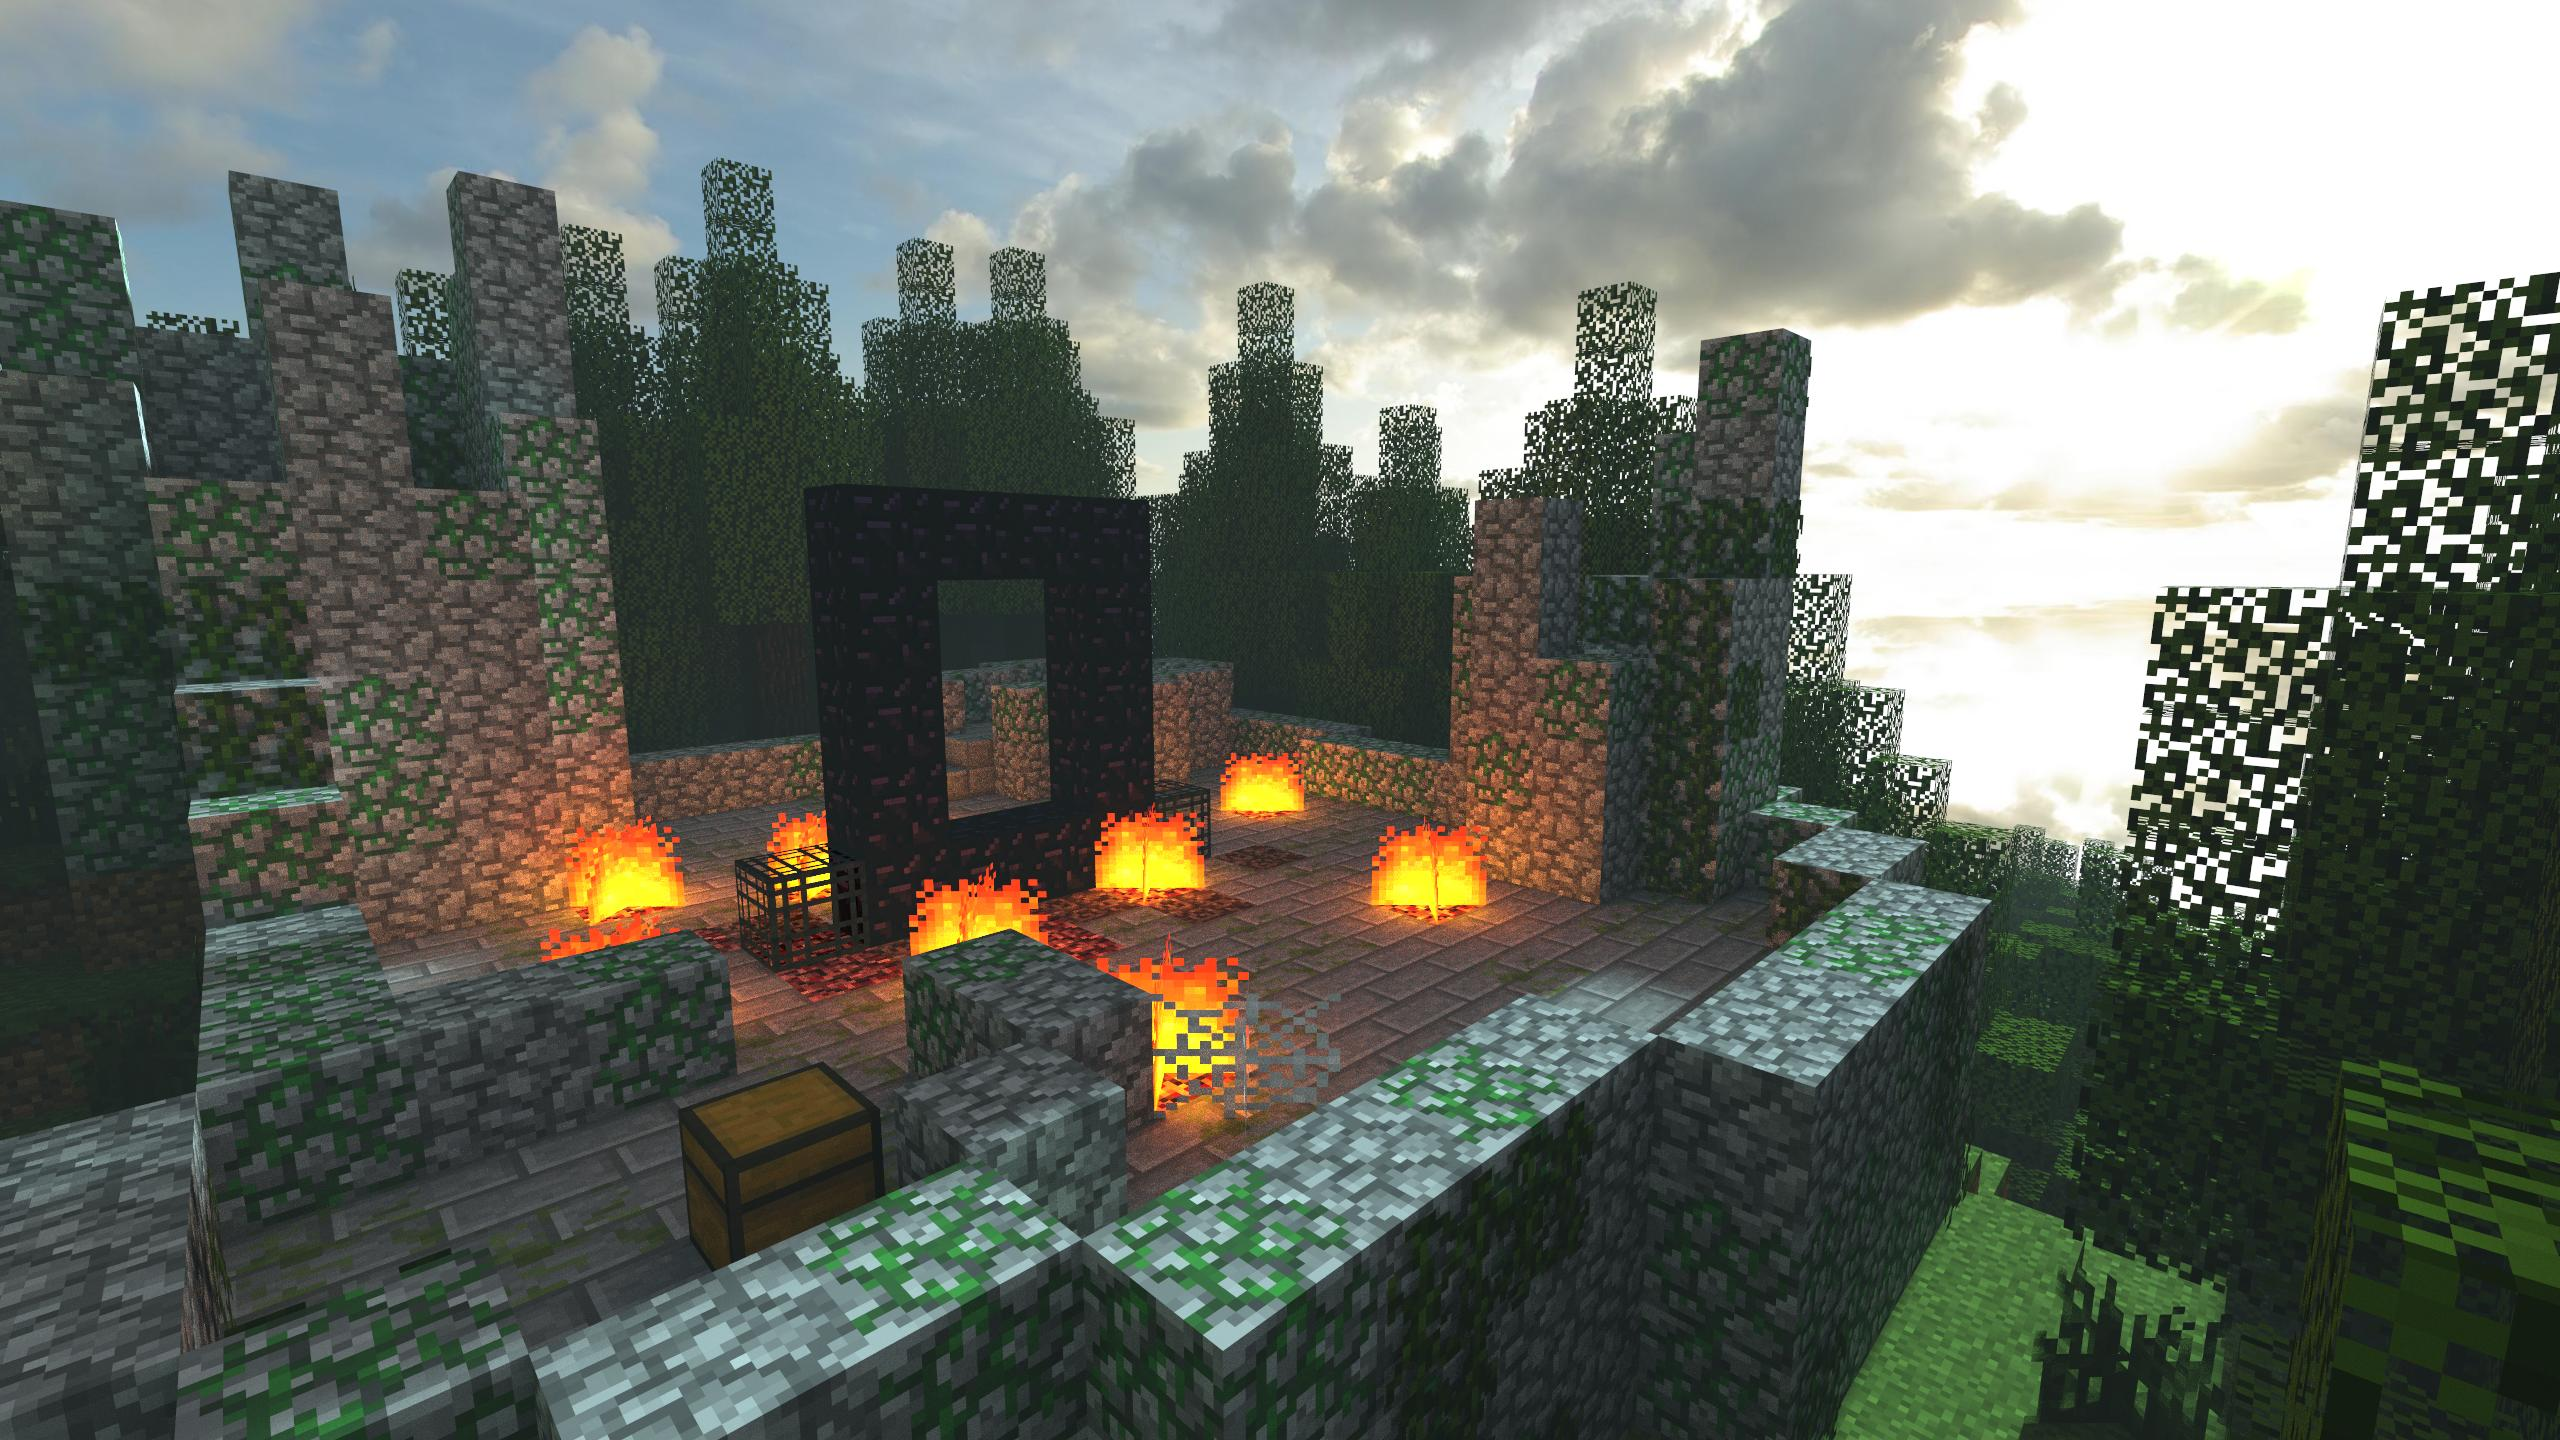 Download Best Minecraft Wallpapers Ever Minecraft In